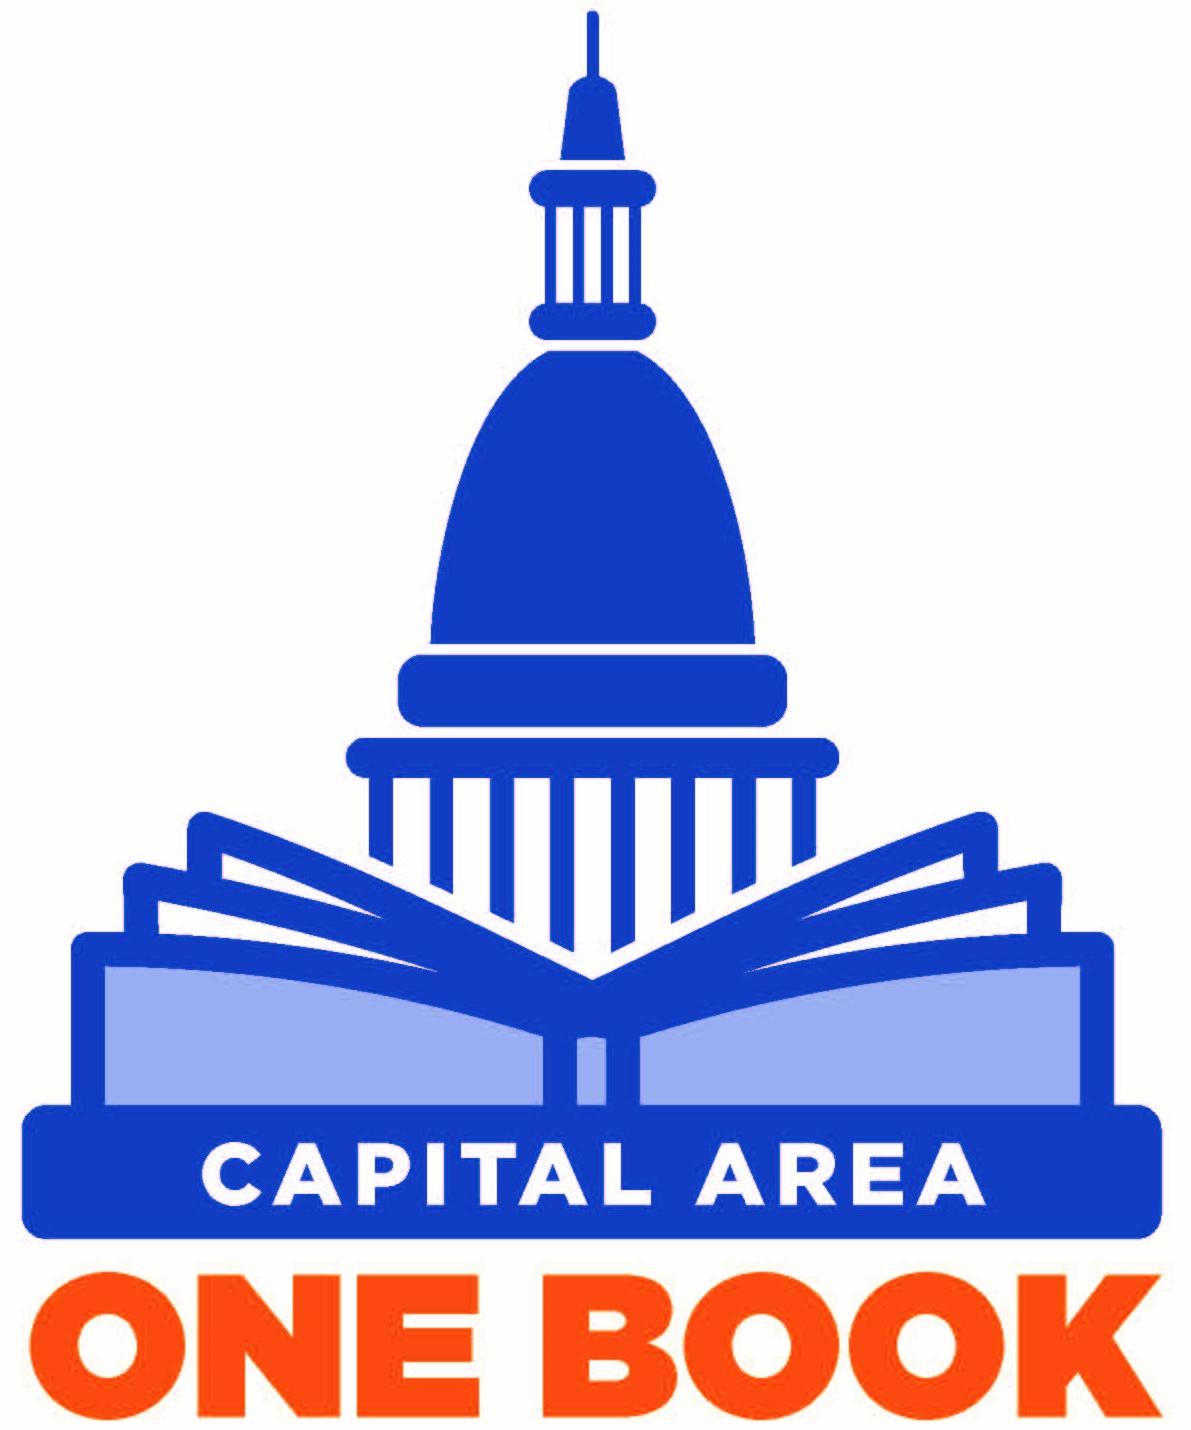 Capital Area One Book